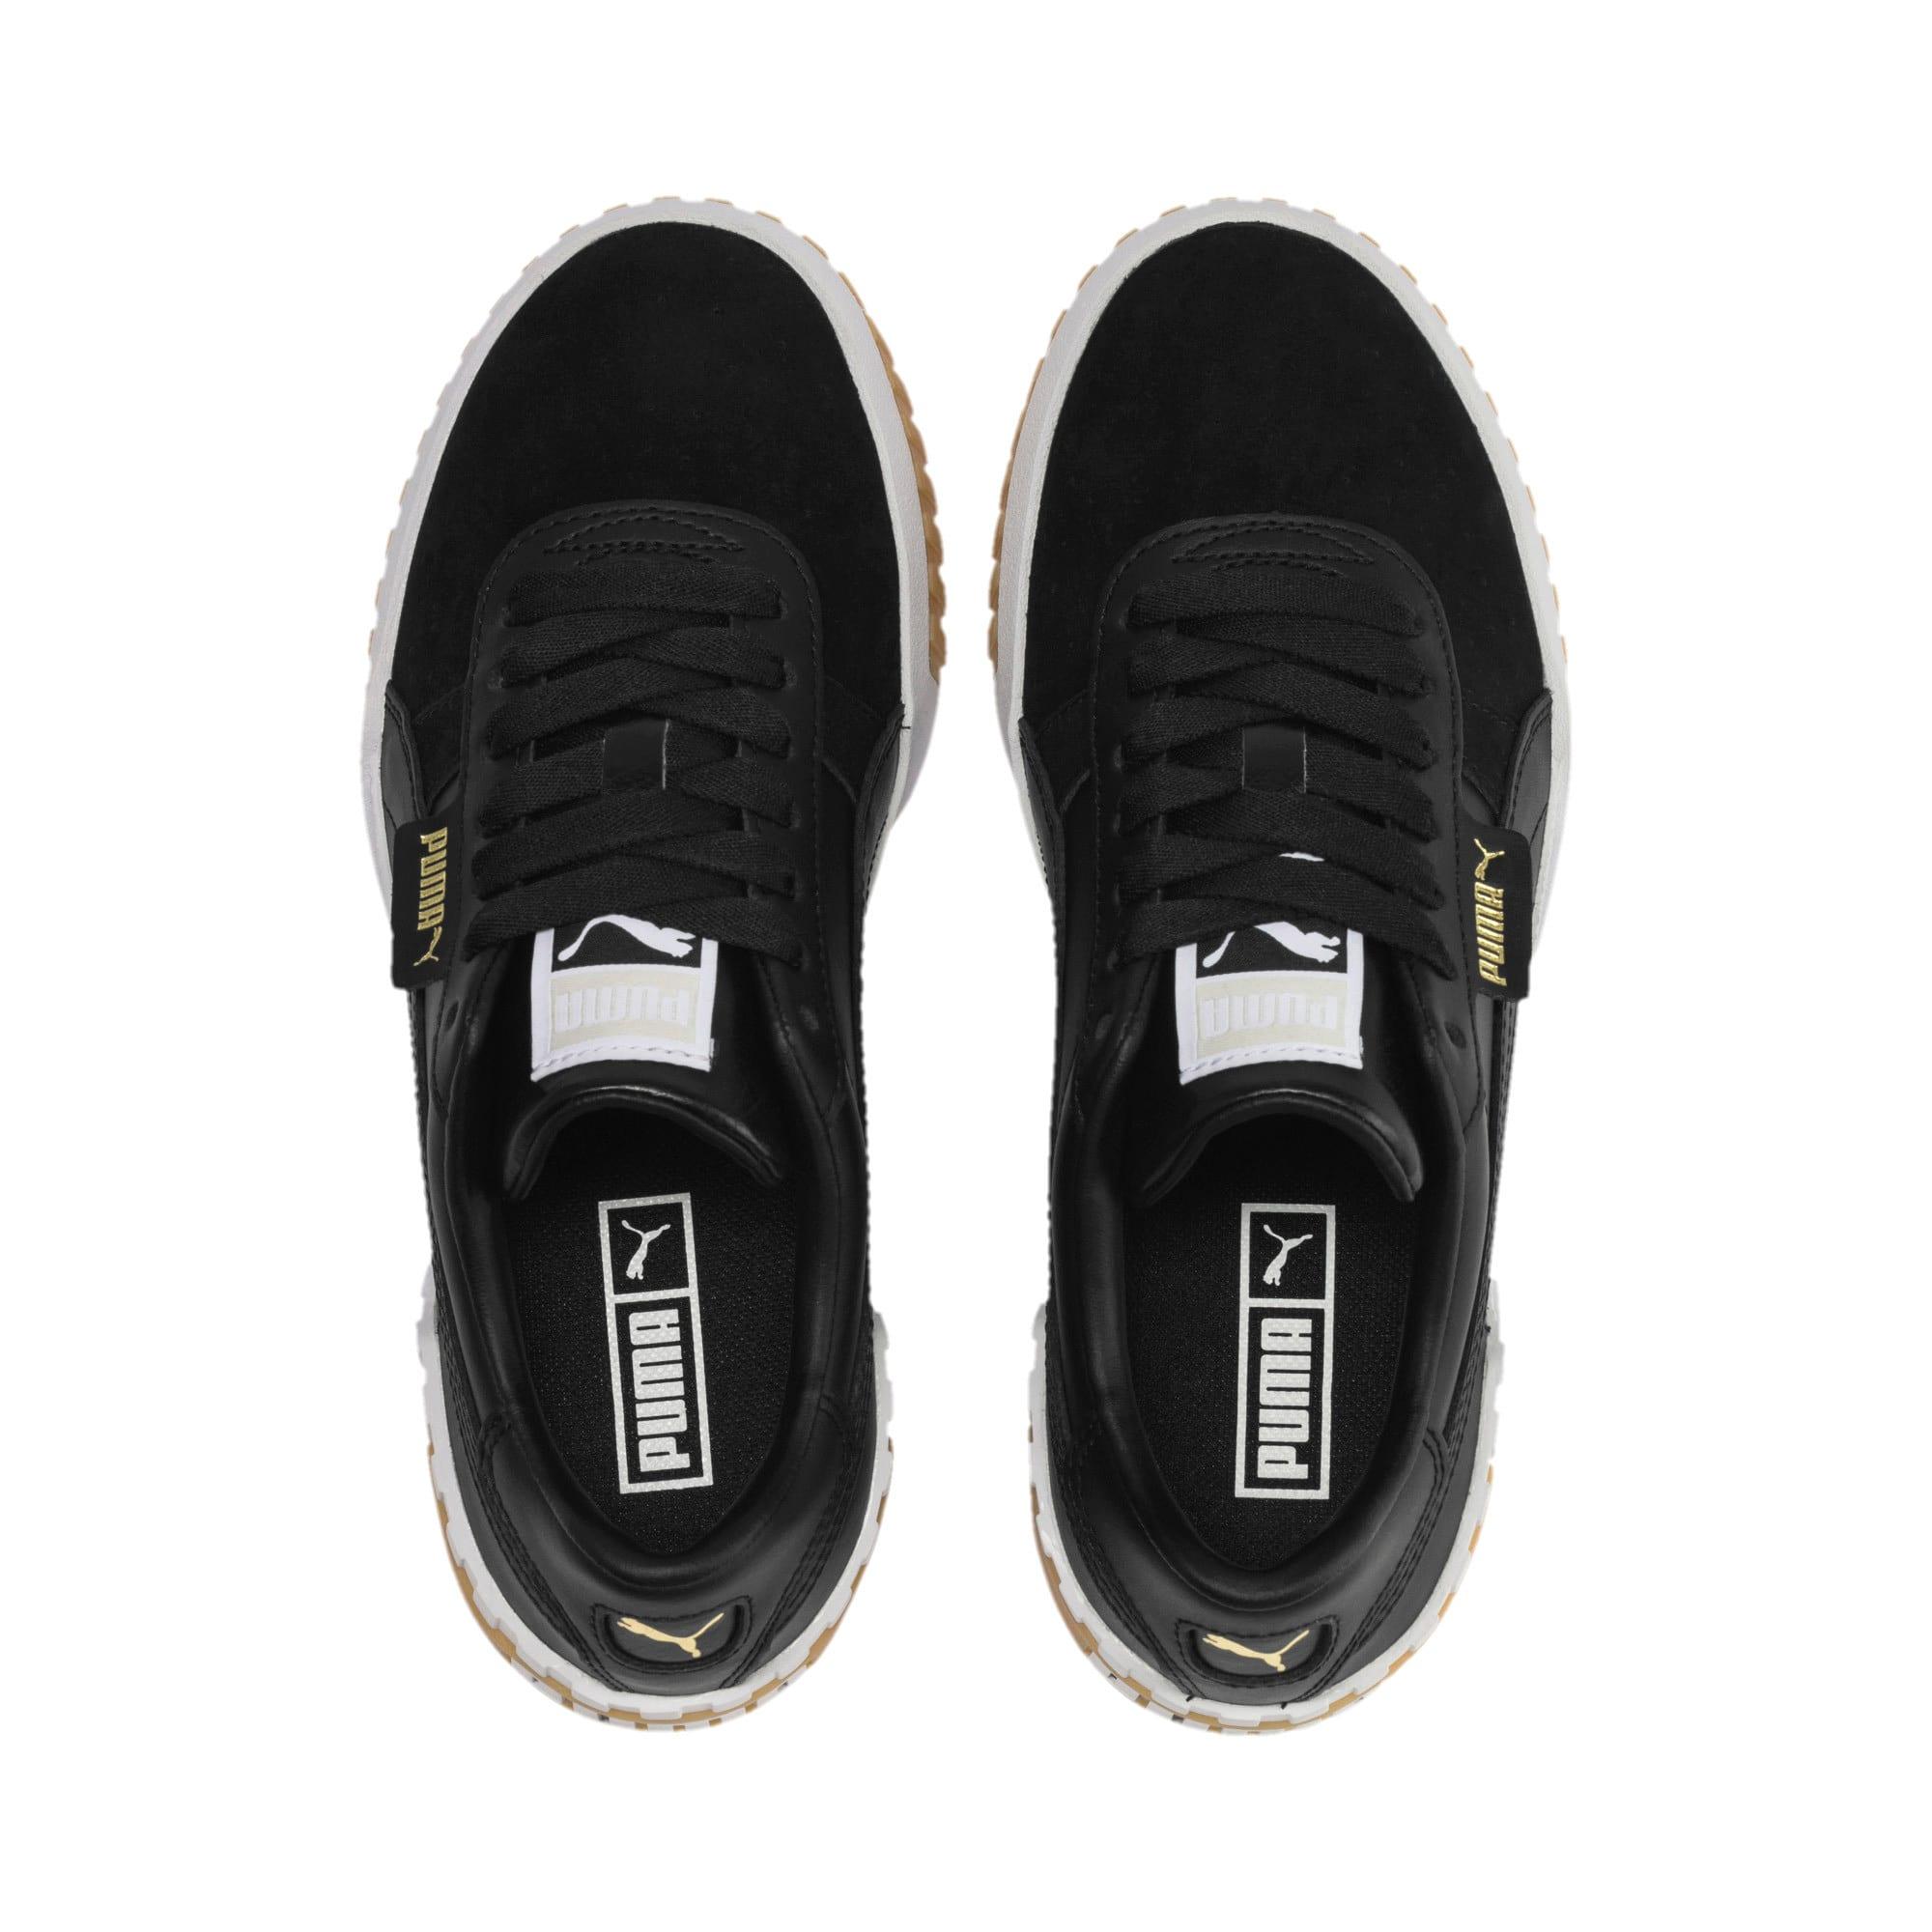 Thumbnail 6 of Cali Exotic Women's Sneakers, Puma Black-Puma Black, medium